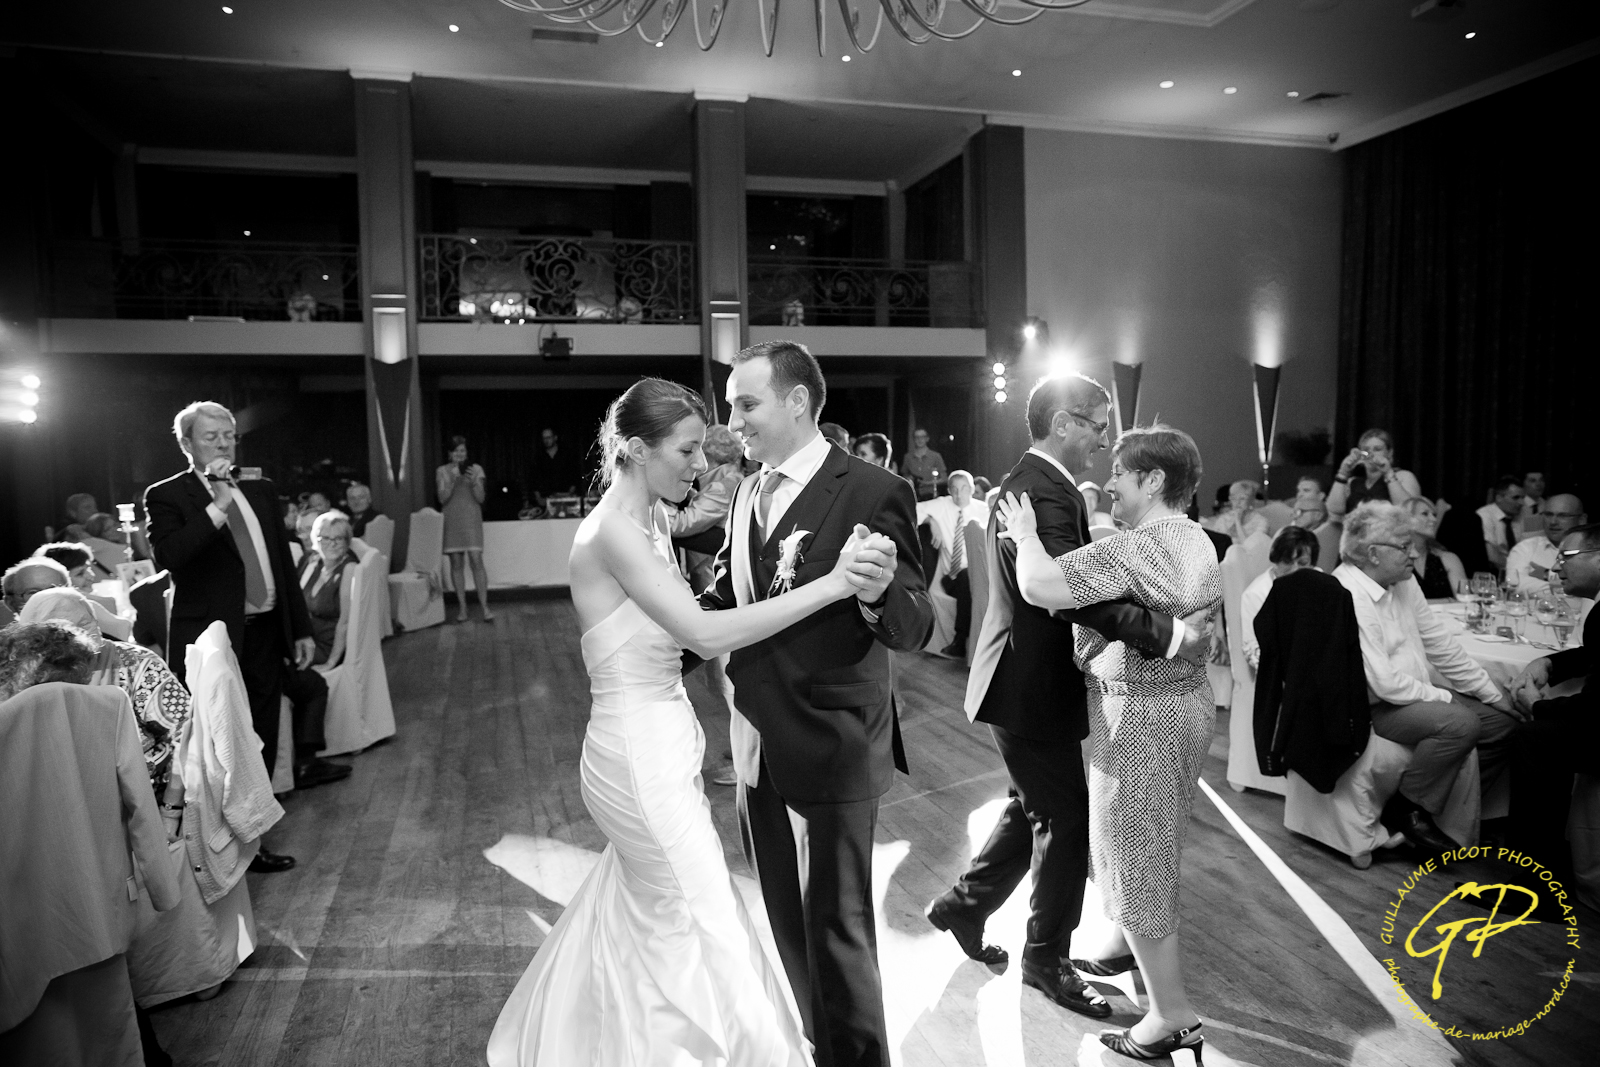 photographe mariage nord (89 sur 96)